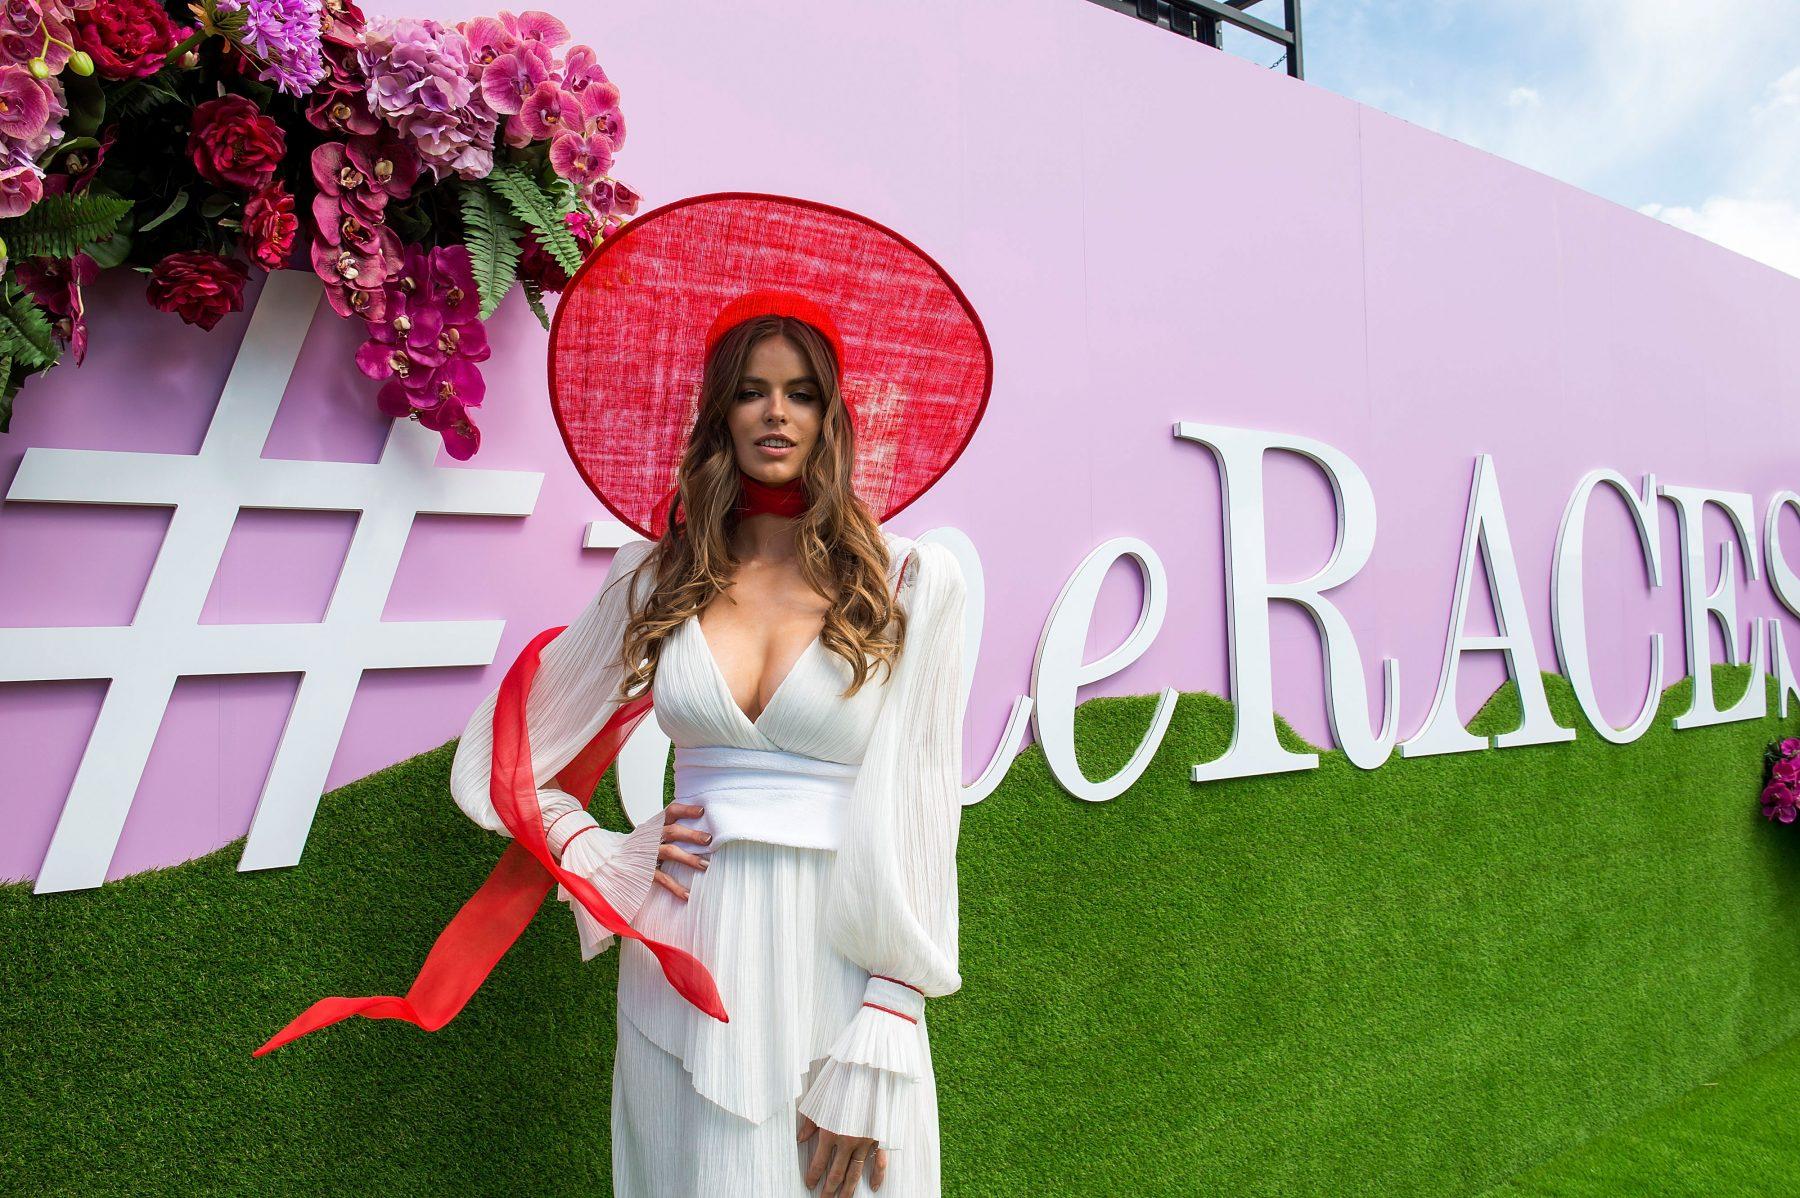 Plussize-model Robyn Lawley wil boycot 'Victoria's Secret Fashion Show' wegens gebrek diversiteit